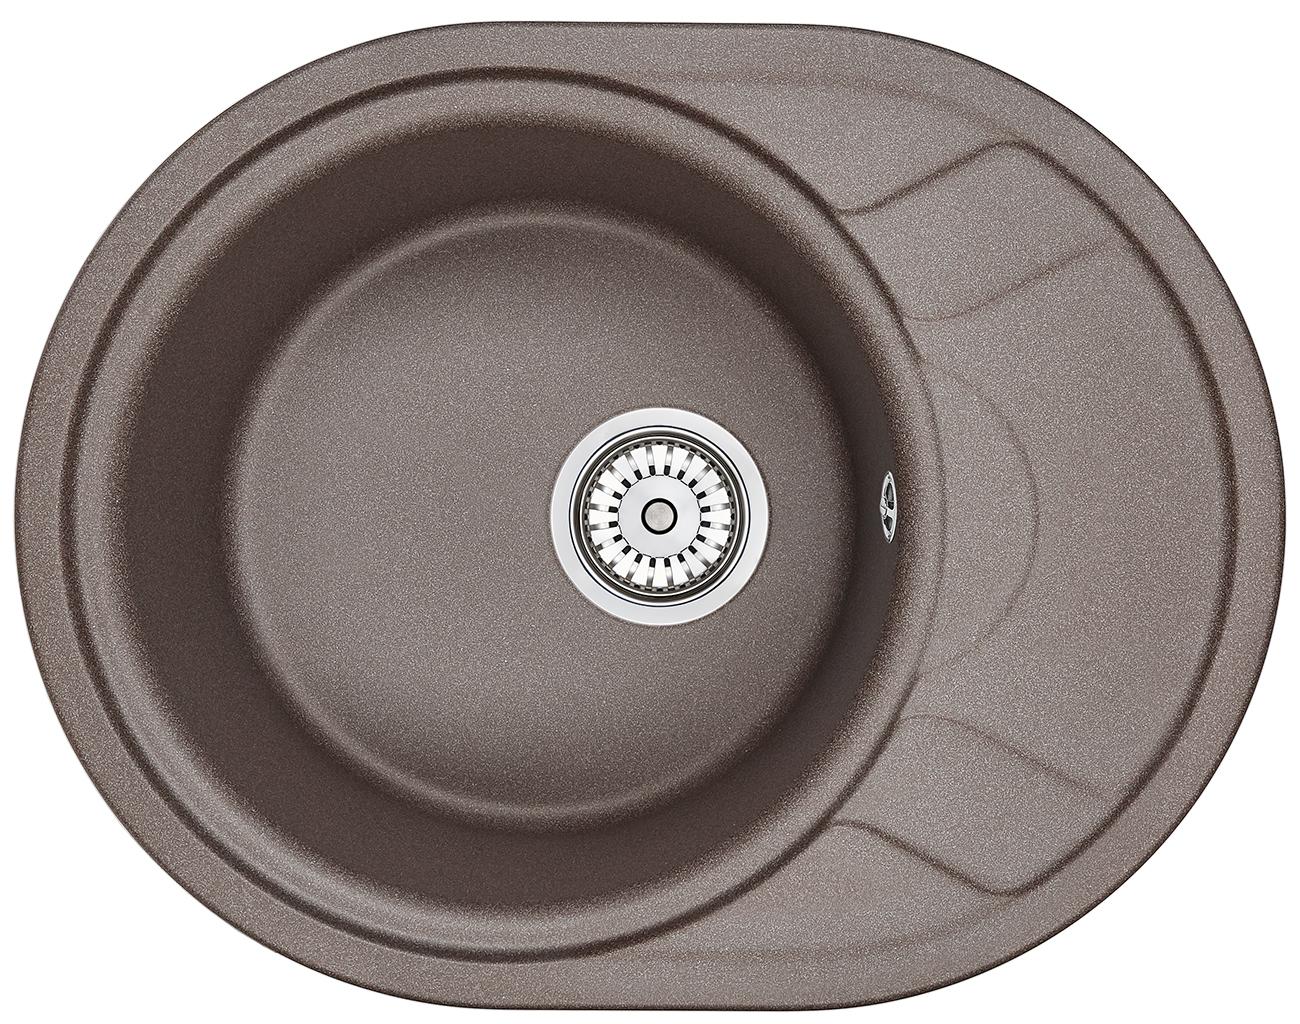 Мойка кухонная Granula Gr-5802 кухонная мойка granula 4201 классик